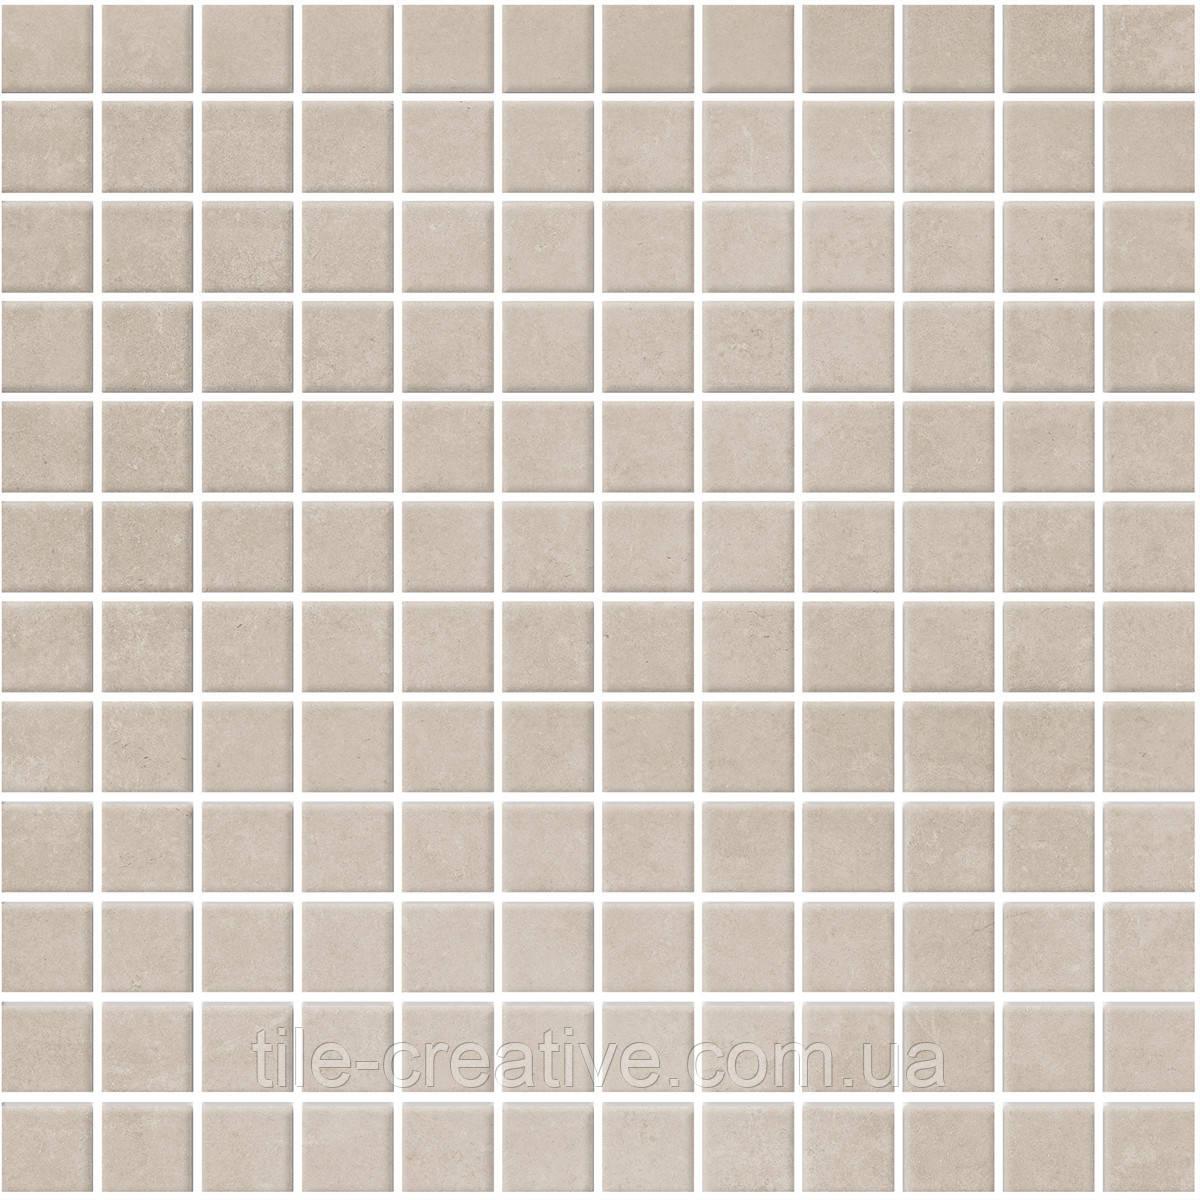 Мозаика Кастелло беж 29,8х29,8х3,5 20102